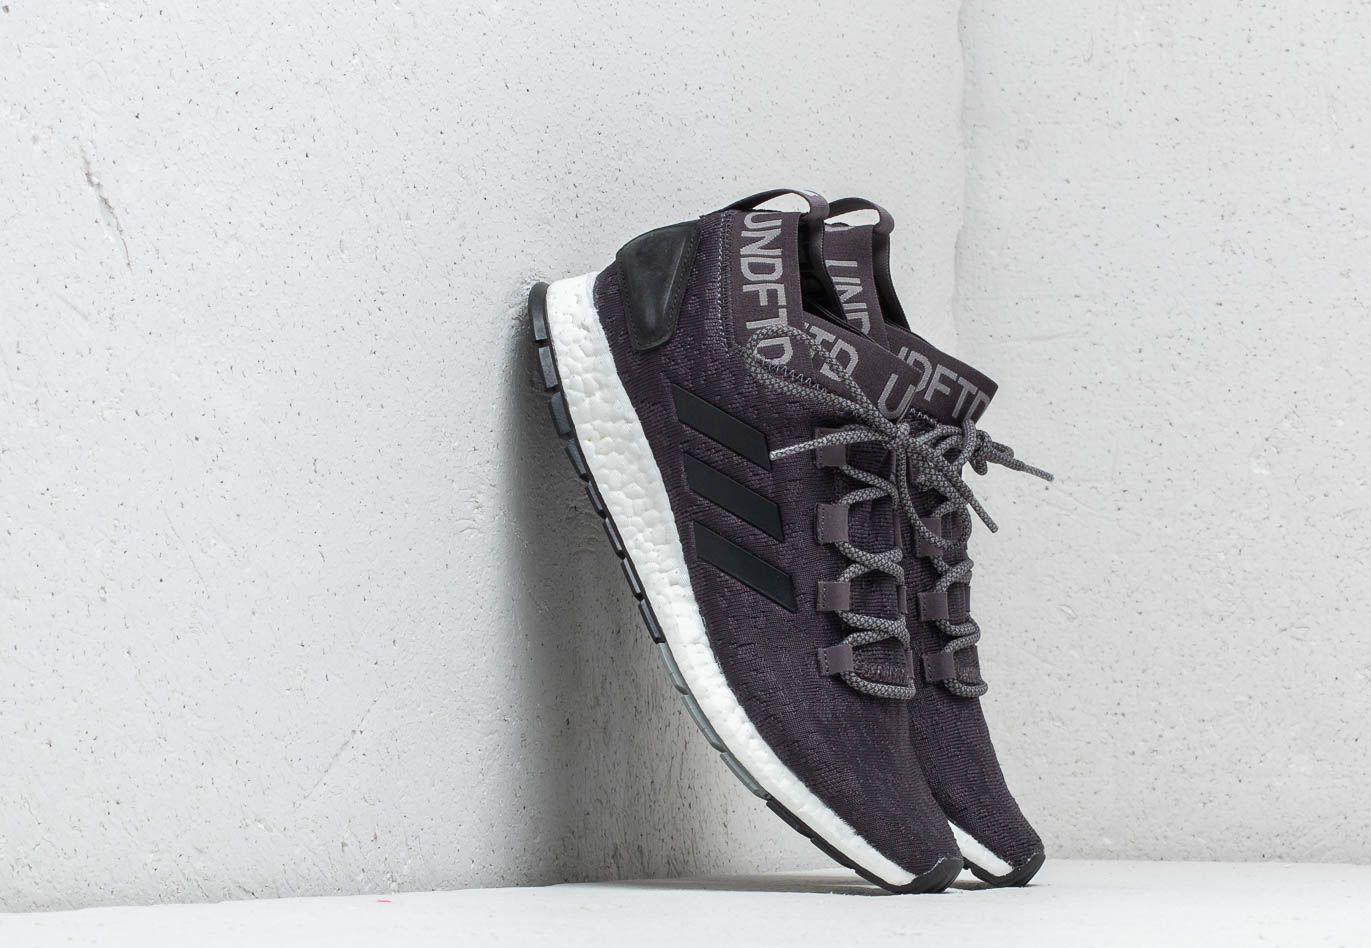 bd9df5ac126e0 adidas Originals. Men s Adidas X Undefeated Pureboost Rbl Core Black  ...